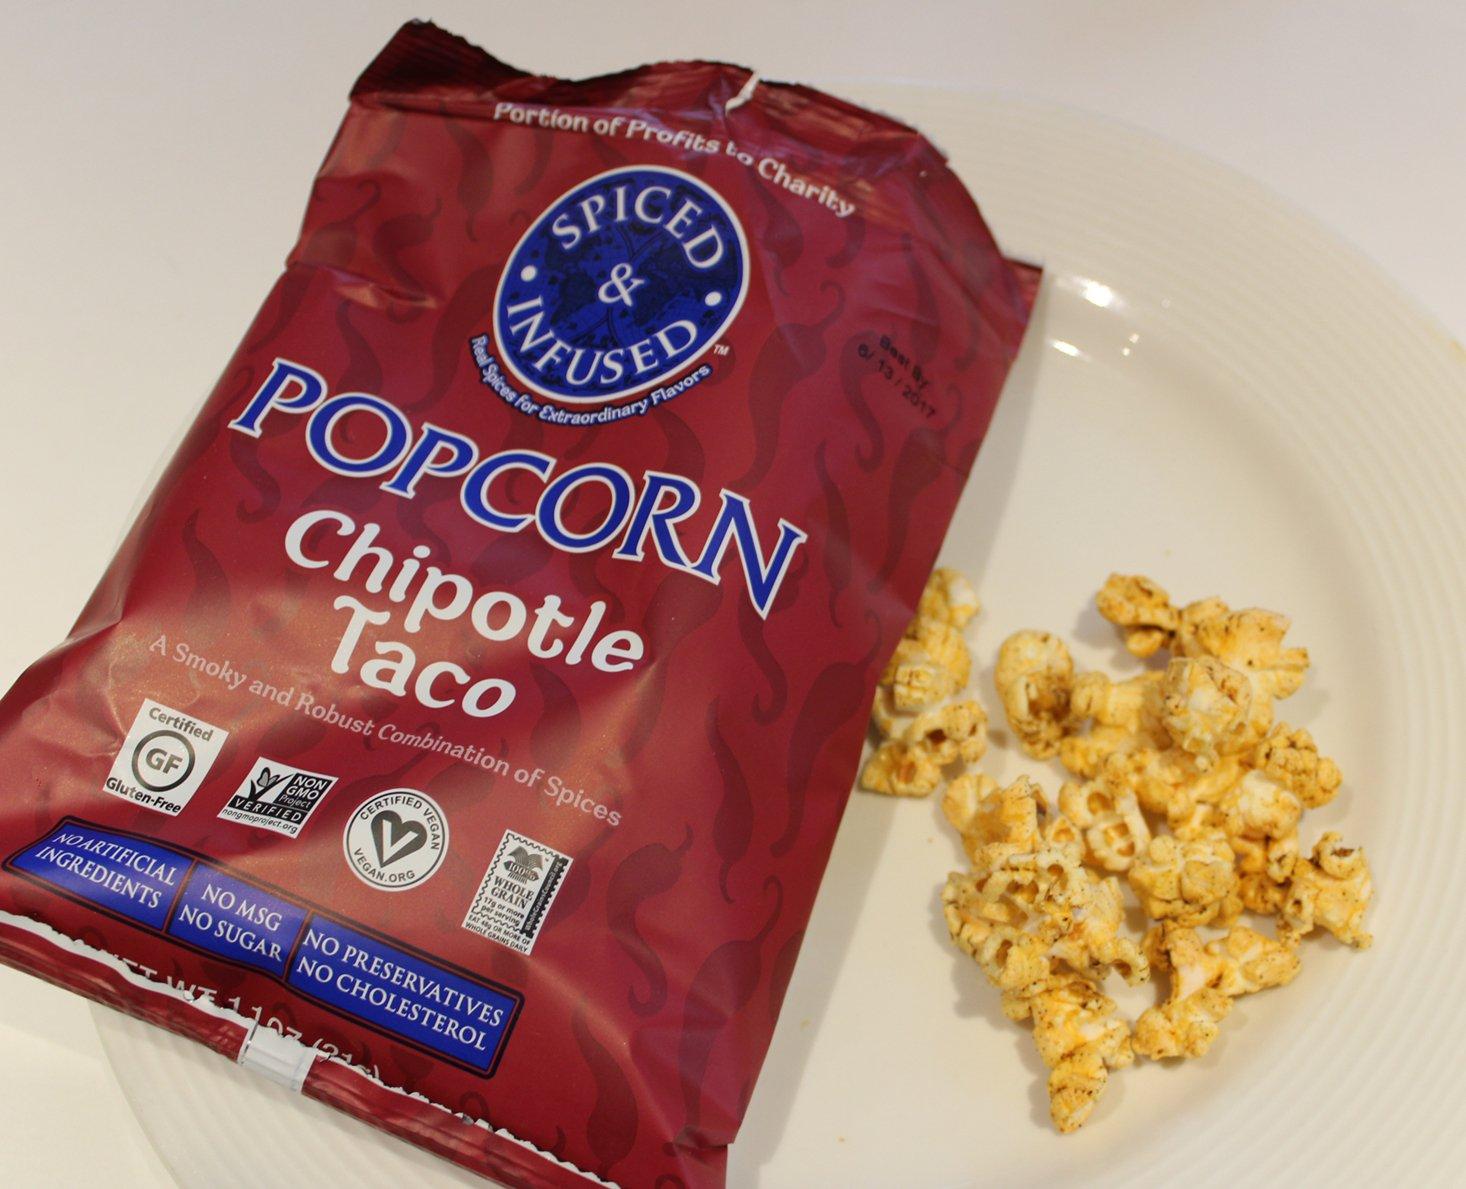 vegan-cuts-snack-february-2017-popcorn